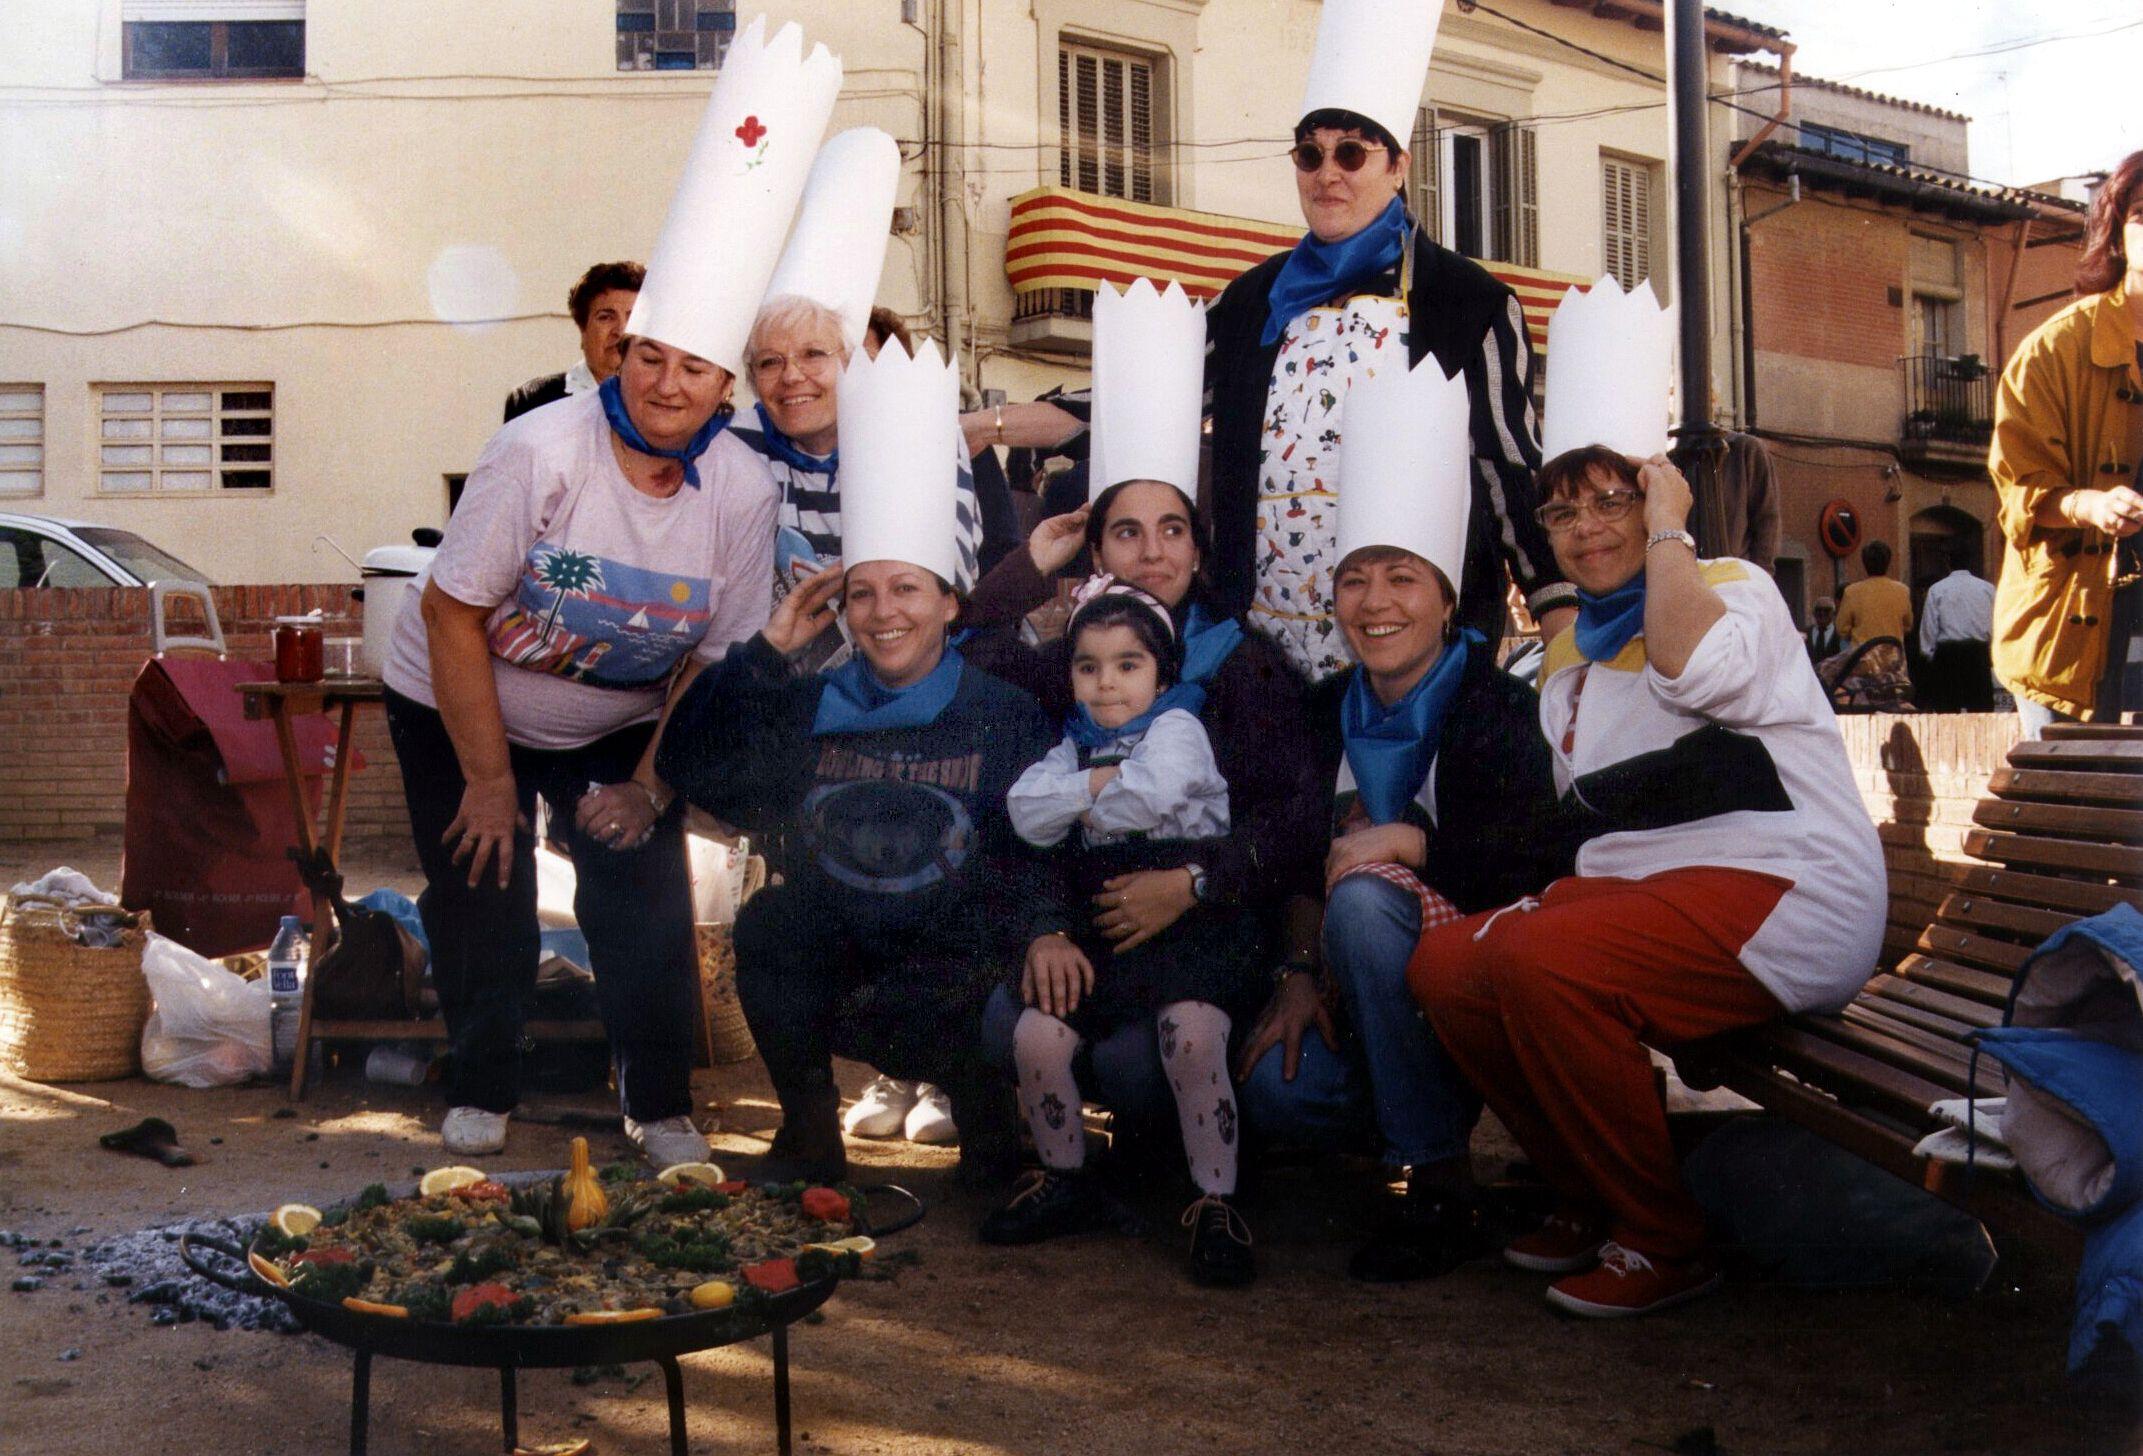 Concurs de paelles a la plaça Grau i Altayó. Autor: Pepe Urbano